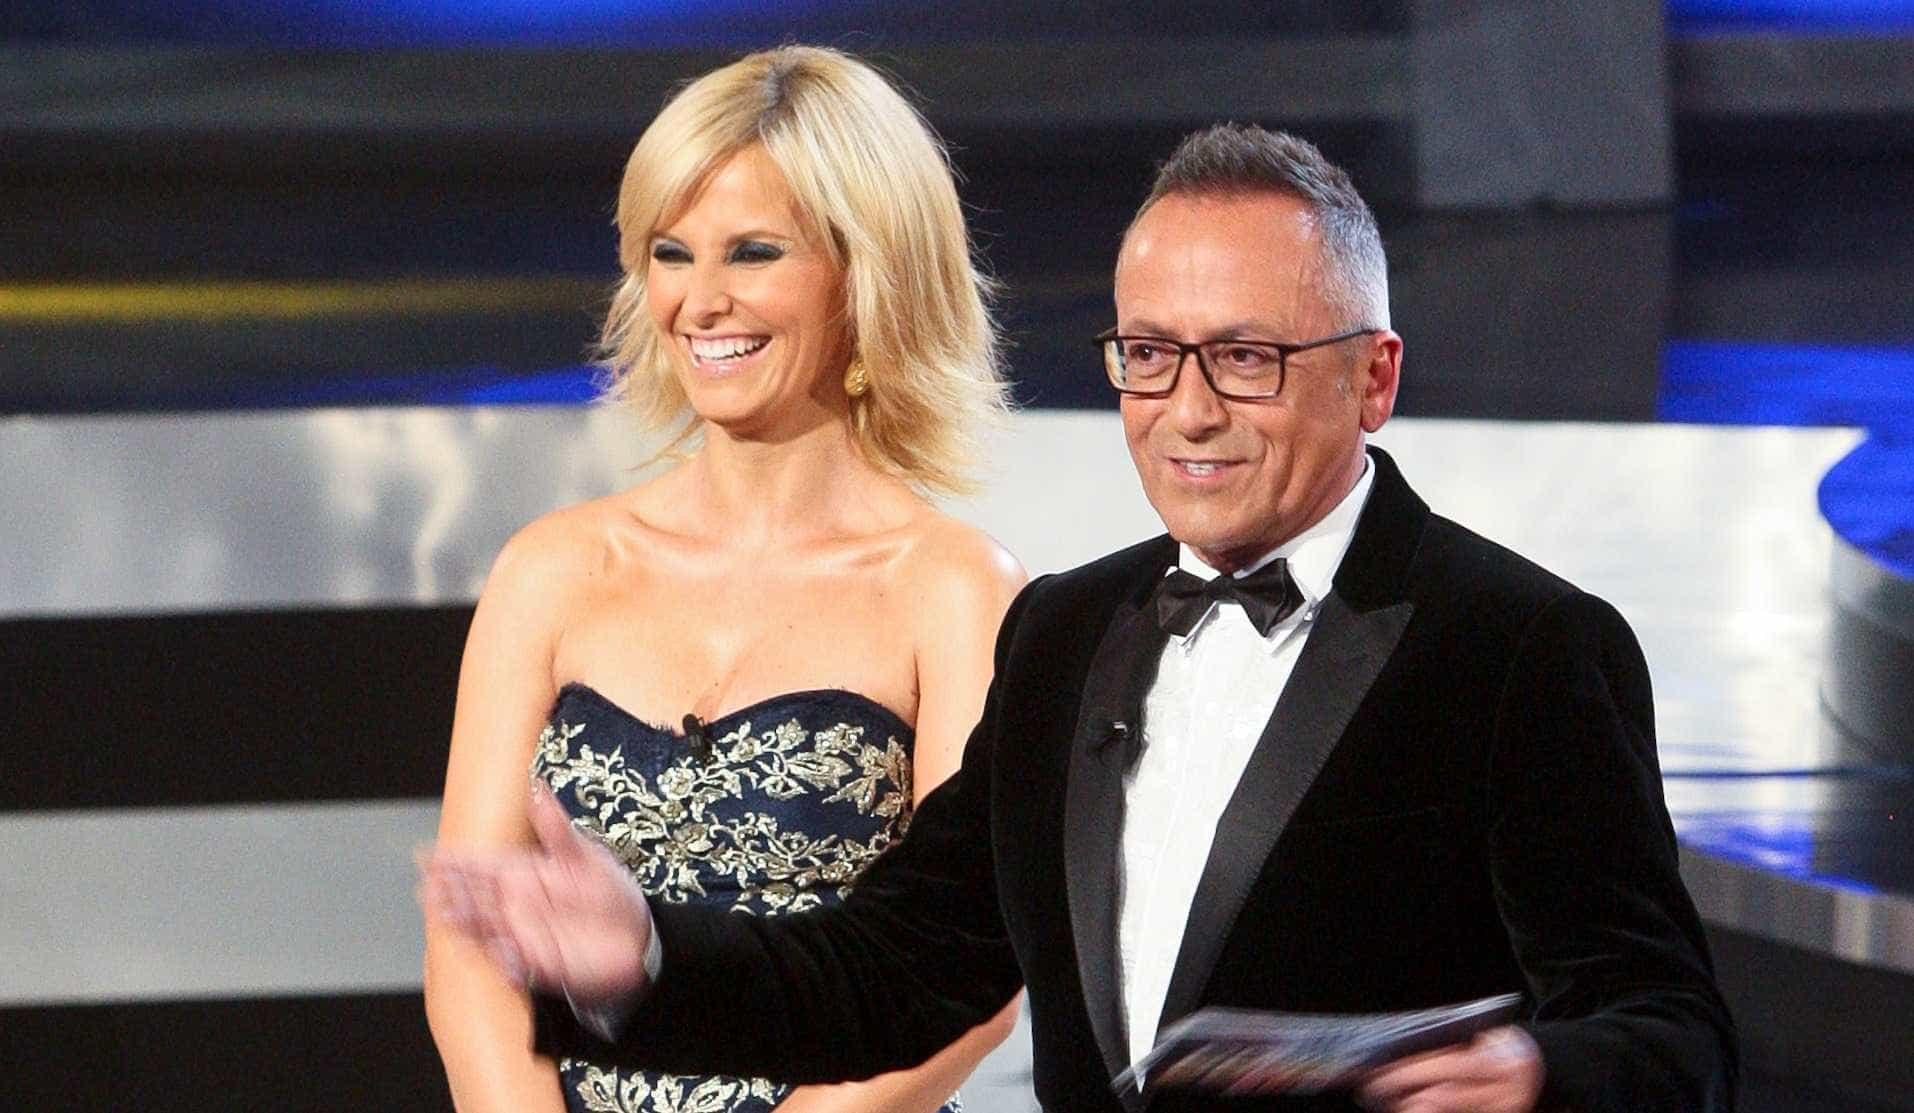 A amizade com Cristina Ferreira acabou? A resposta de Manuel Luís Goucha